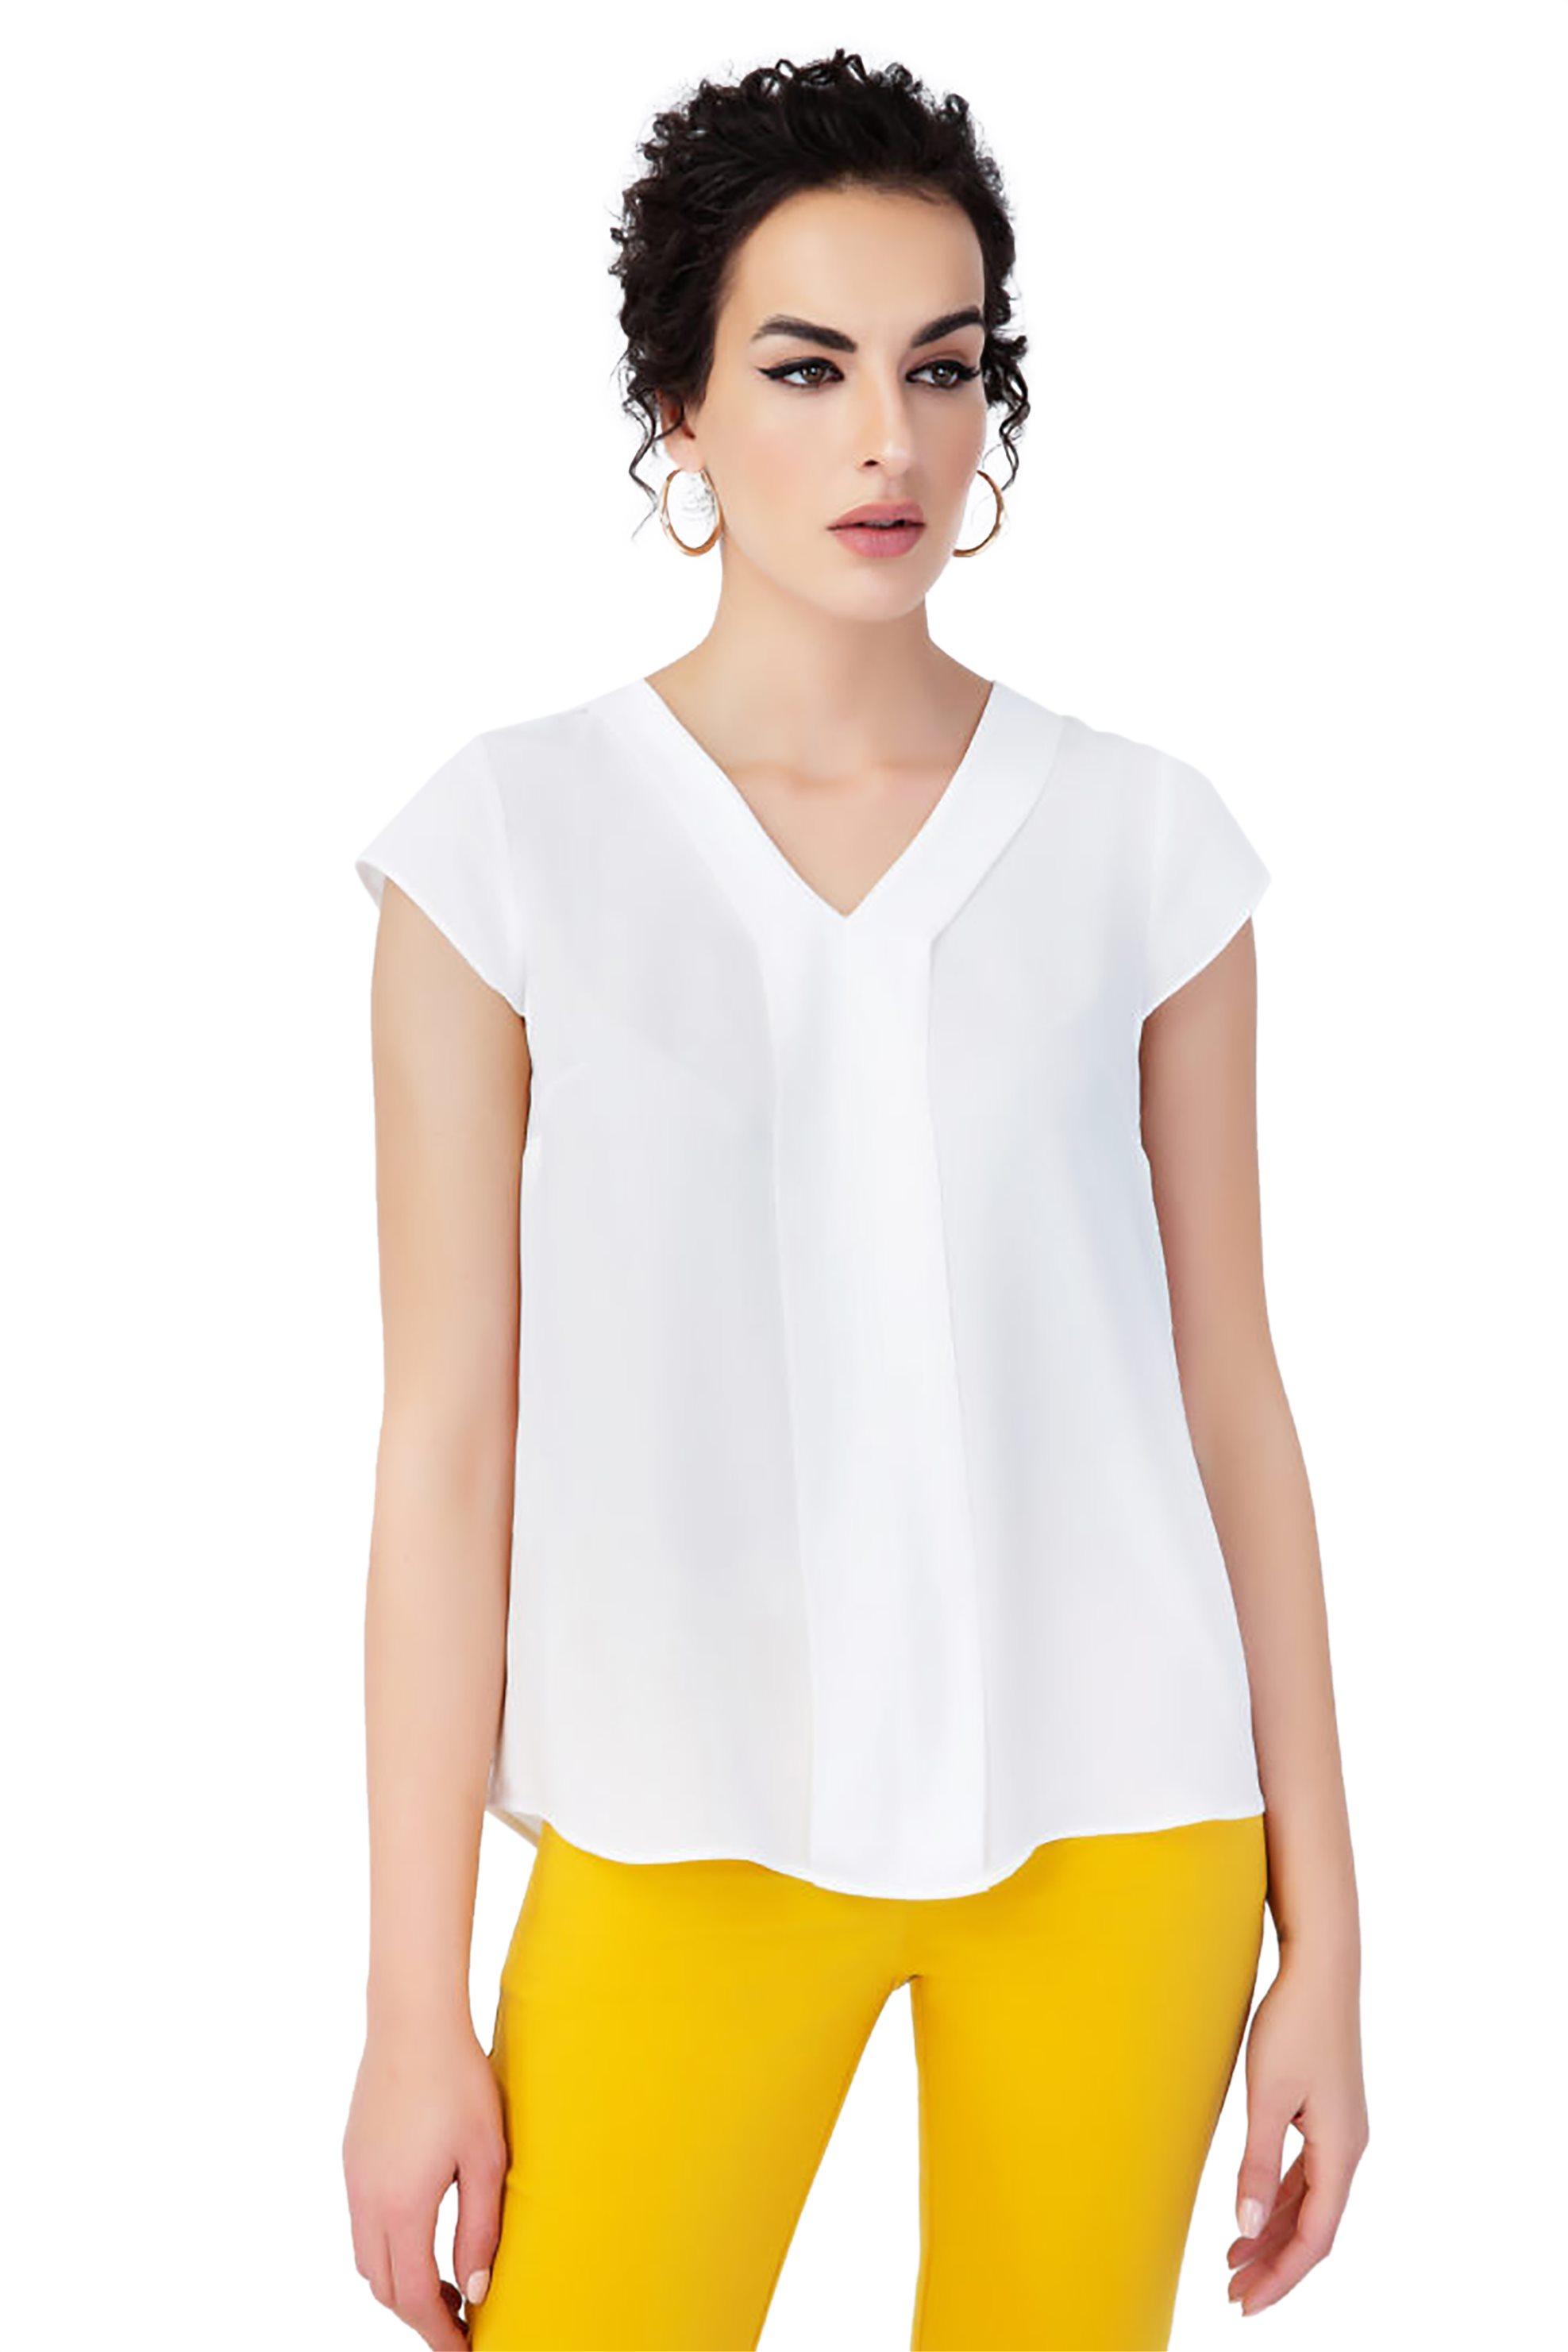 f469098bc856 Notos Billy Sabbado γυναικεία μπλούζα με V λαιμόκοψη - 0205299448 - Λευκό